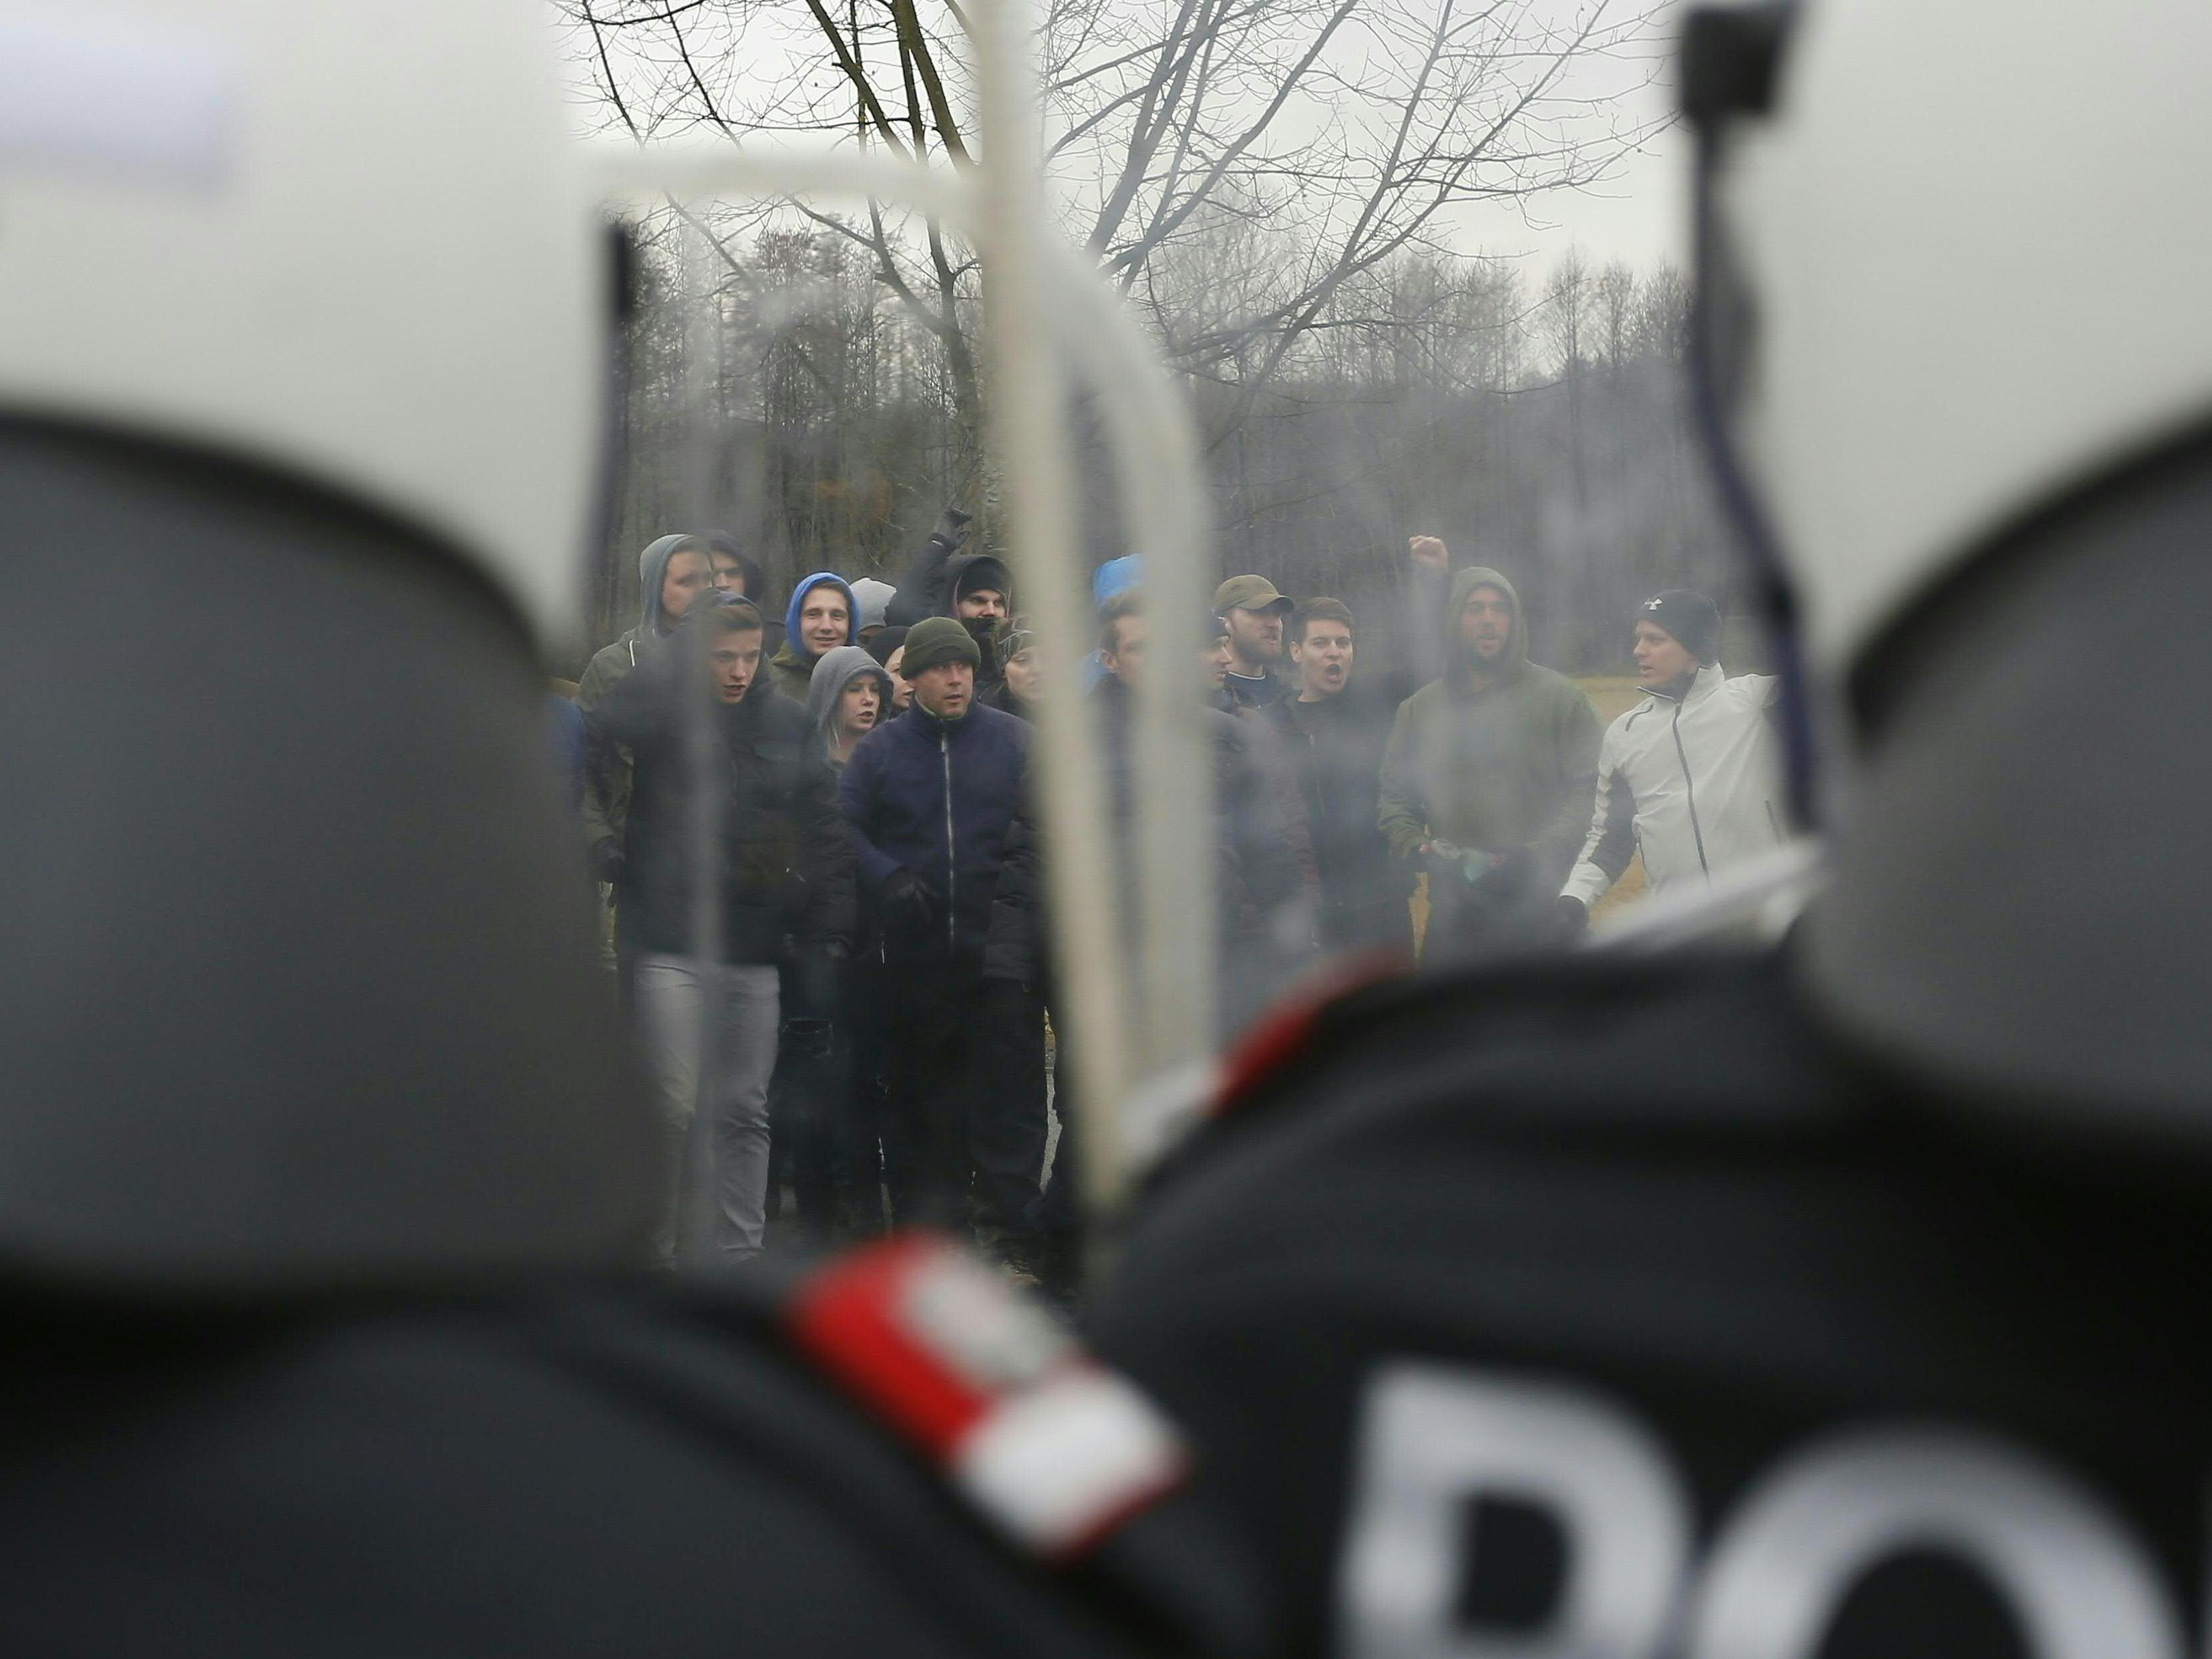 Flüchtlinge - Keine große Kriminalitätswelle